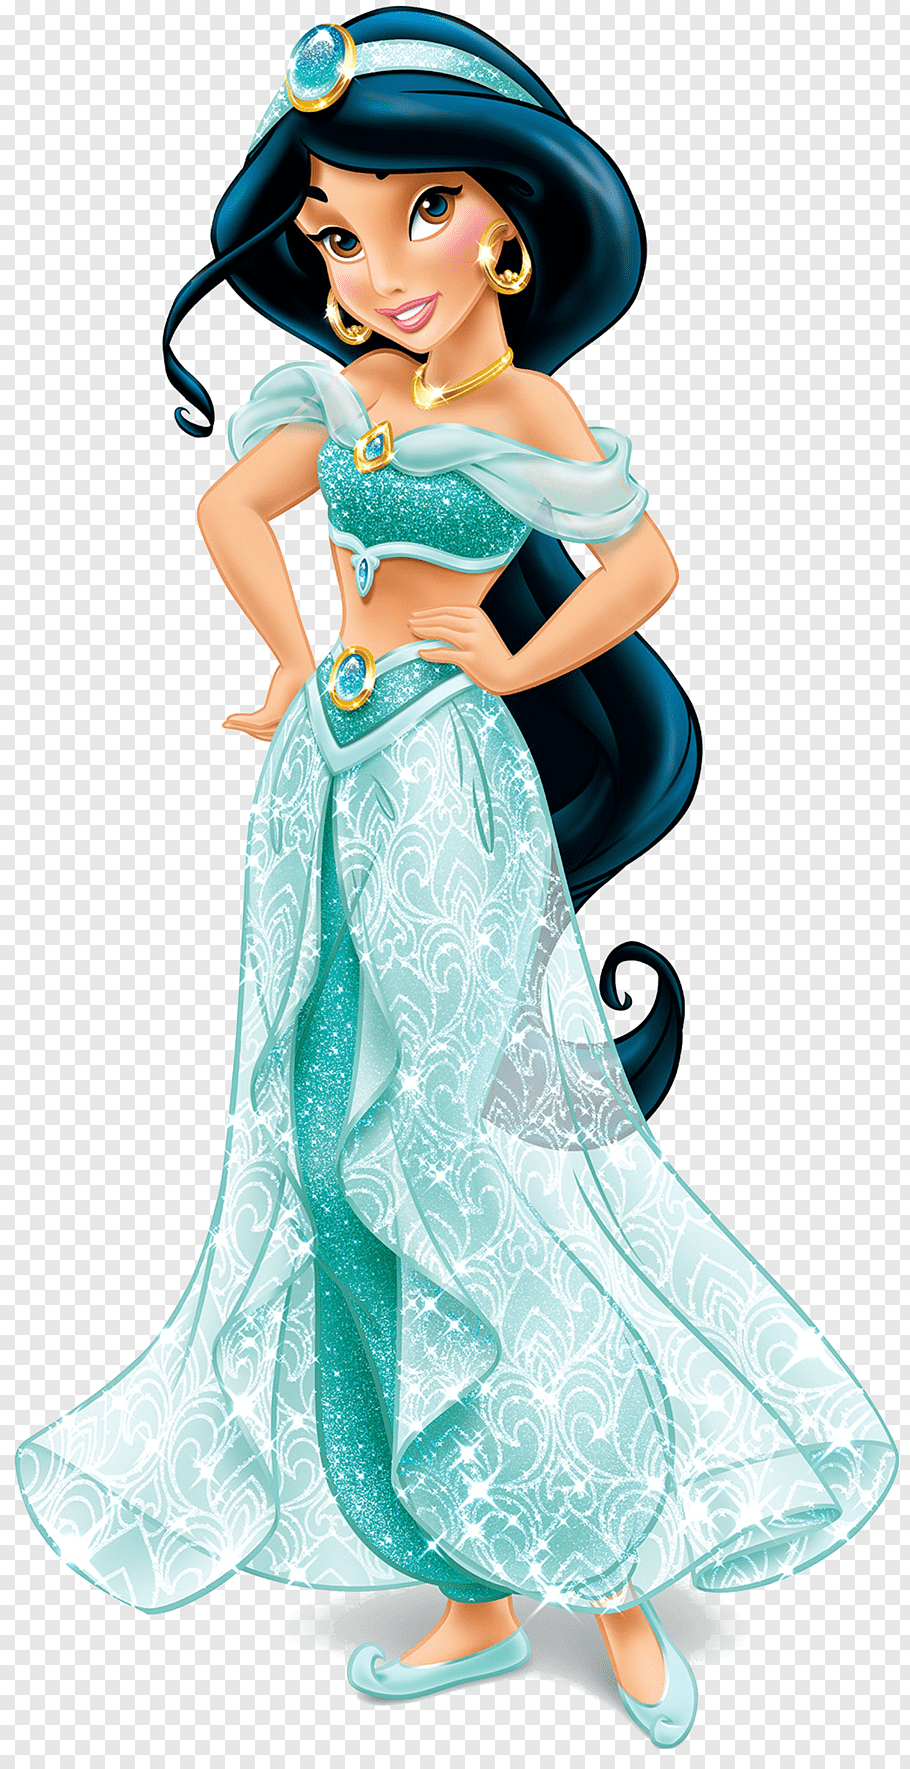 Woman Princess Jasmine Aladdin Jafar Cinderella Disney Princess Princess Jasmine Free Png Disney Princess Jasmine Disney Jasmine Cinderella Disney